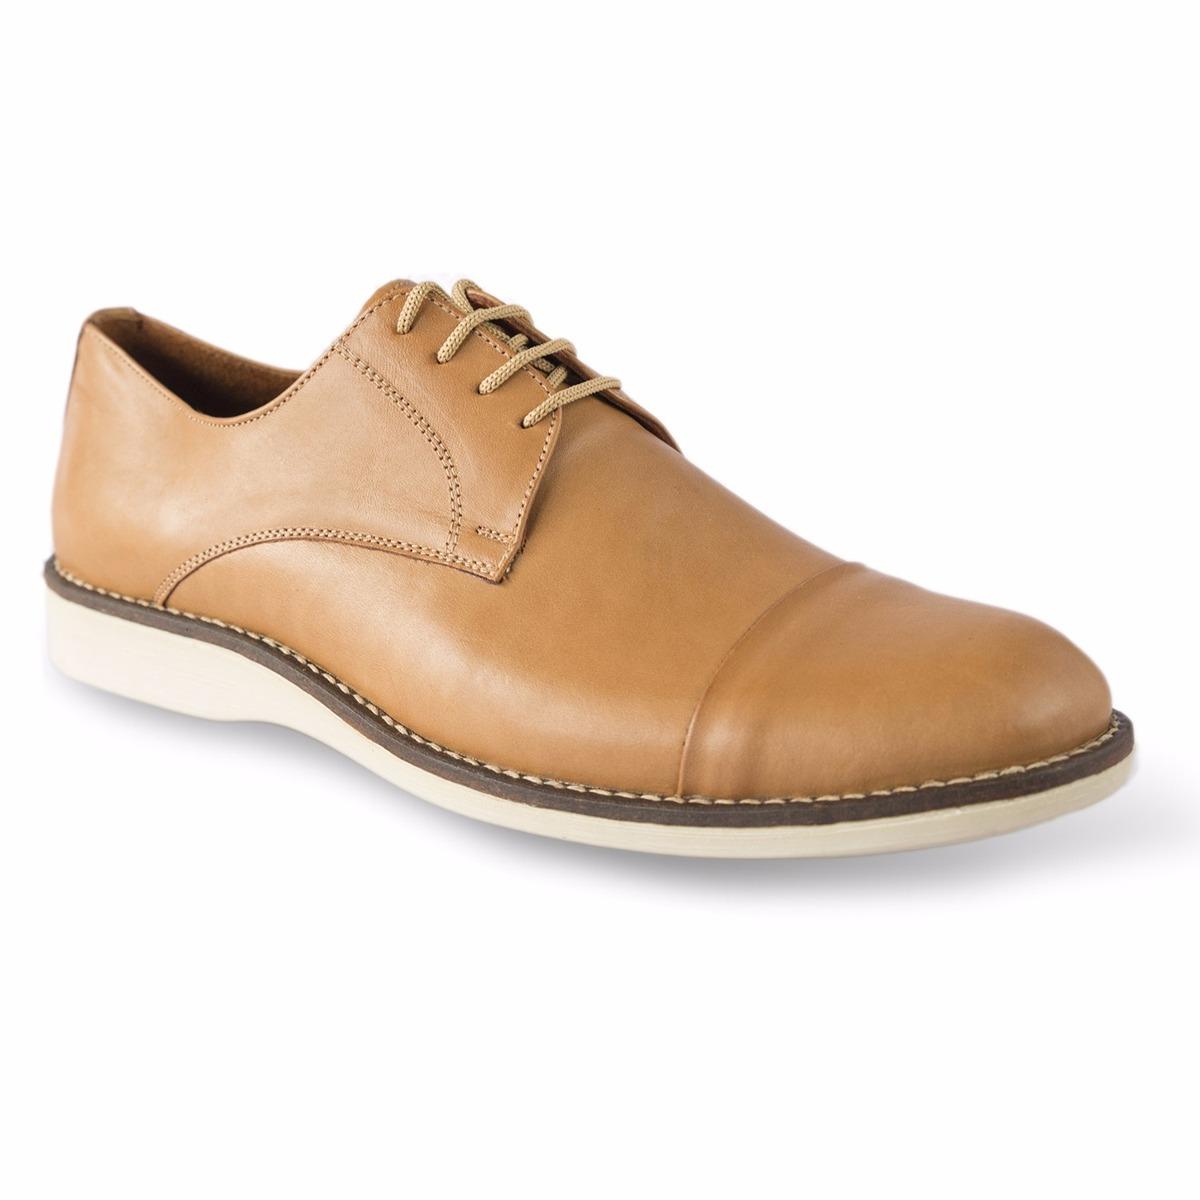 1141de857 zapatos-hombre -vestir-acordonado-mallorca-D_NQ_NP_813560-MLA25649461746_062017-F.jpg